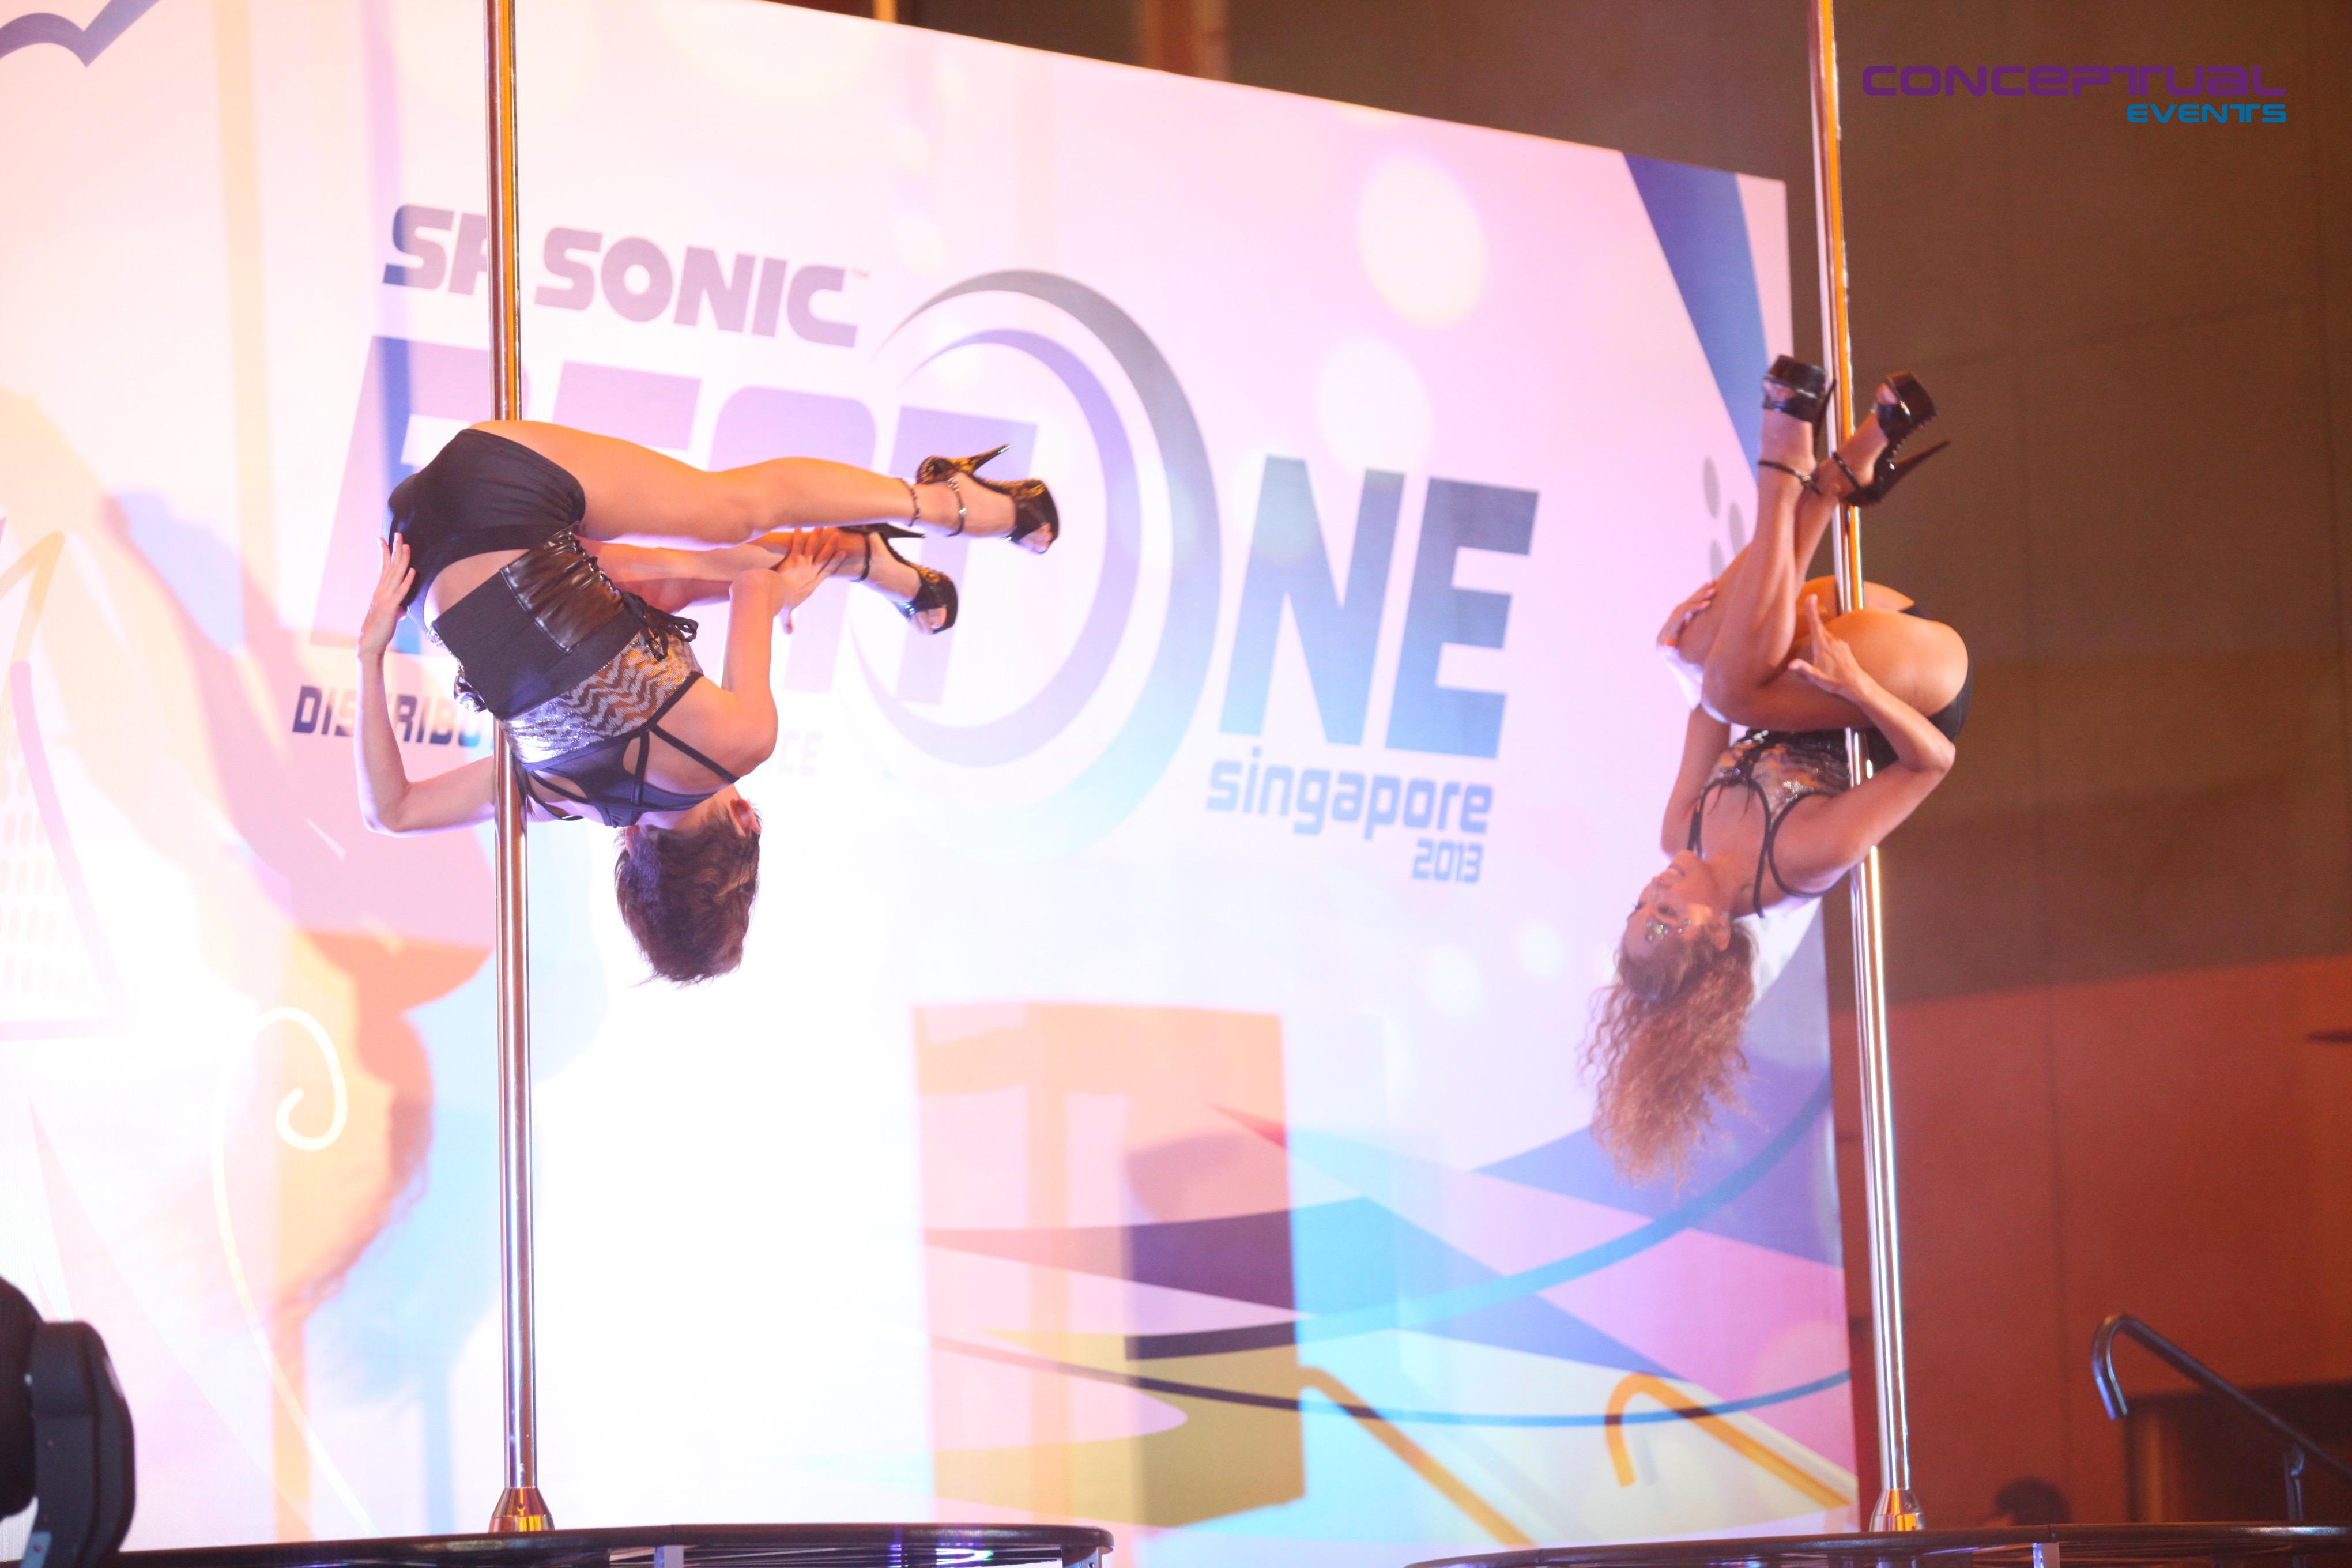 Exide Sonic Event in Singapore